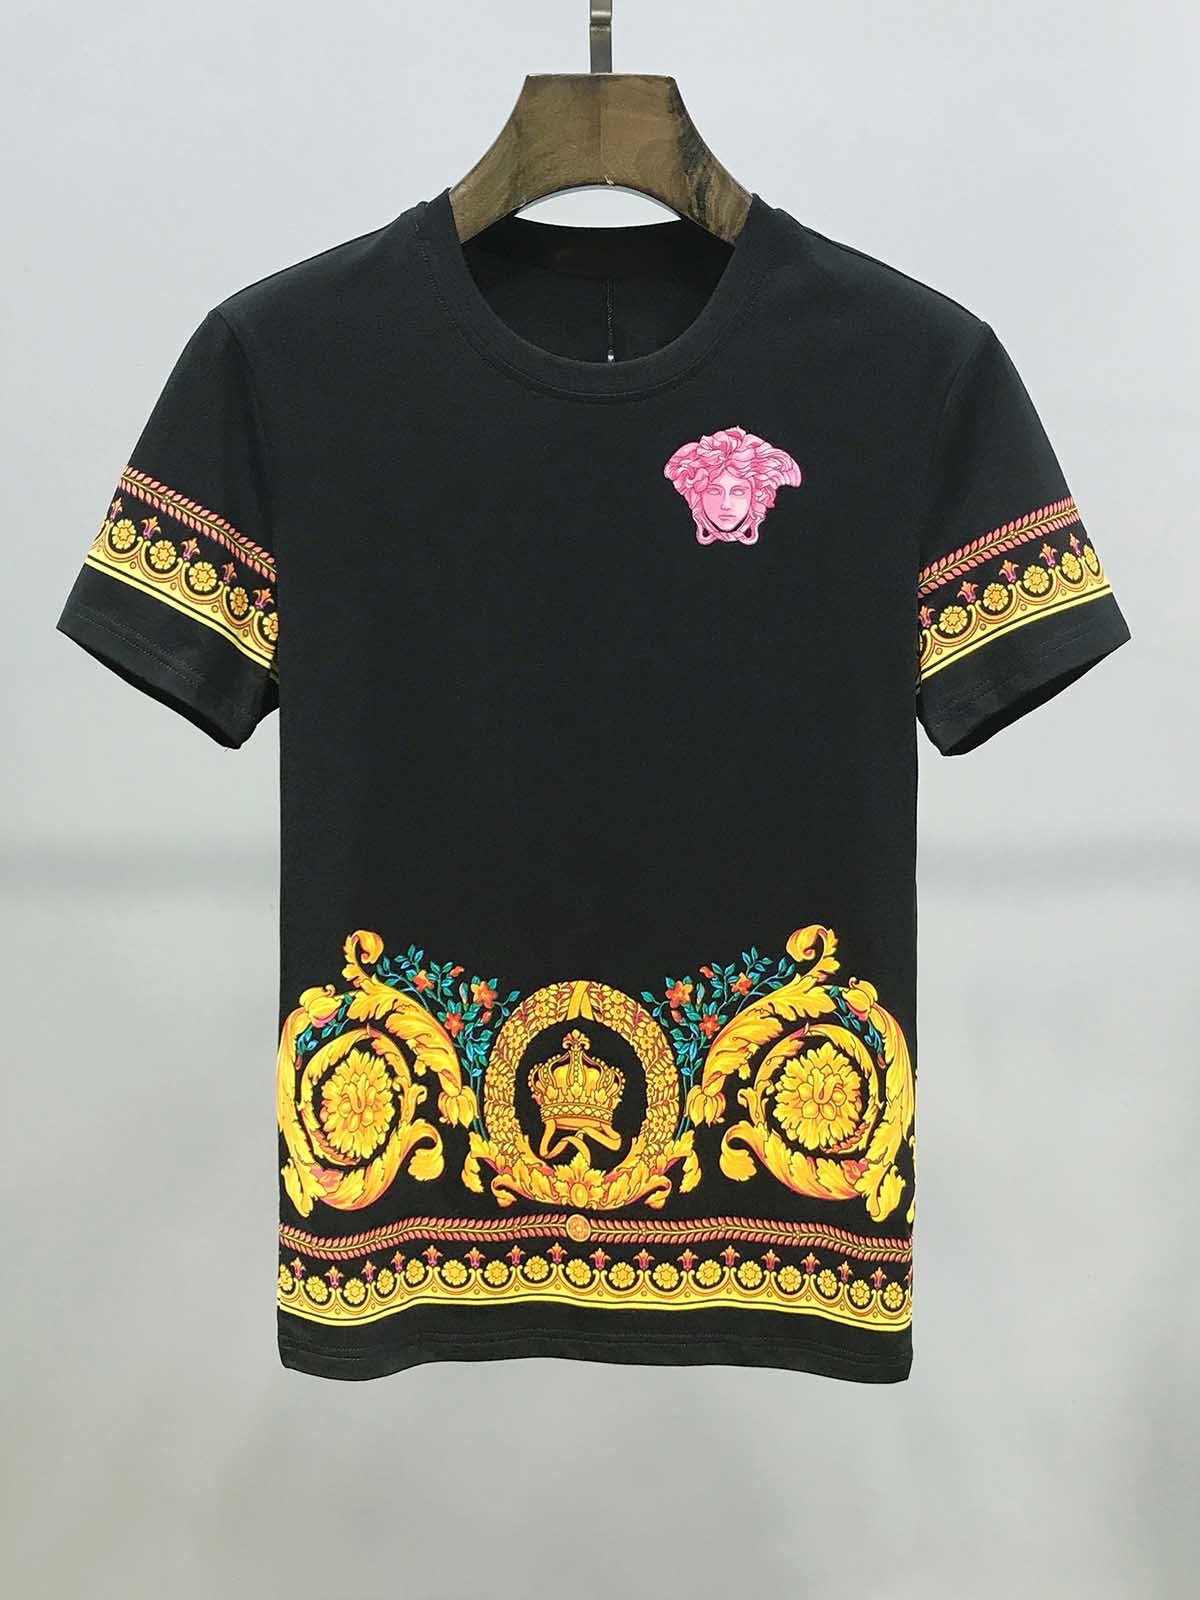 Hommes Femmes Unisexe T Shirt crâne poignard Tatouage Style Rétro Cool look tendance